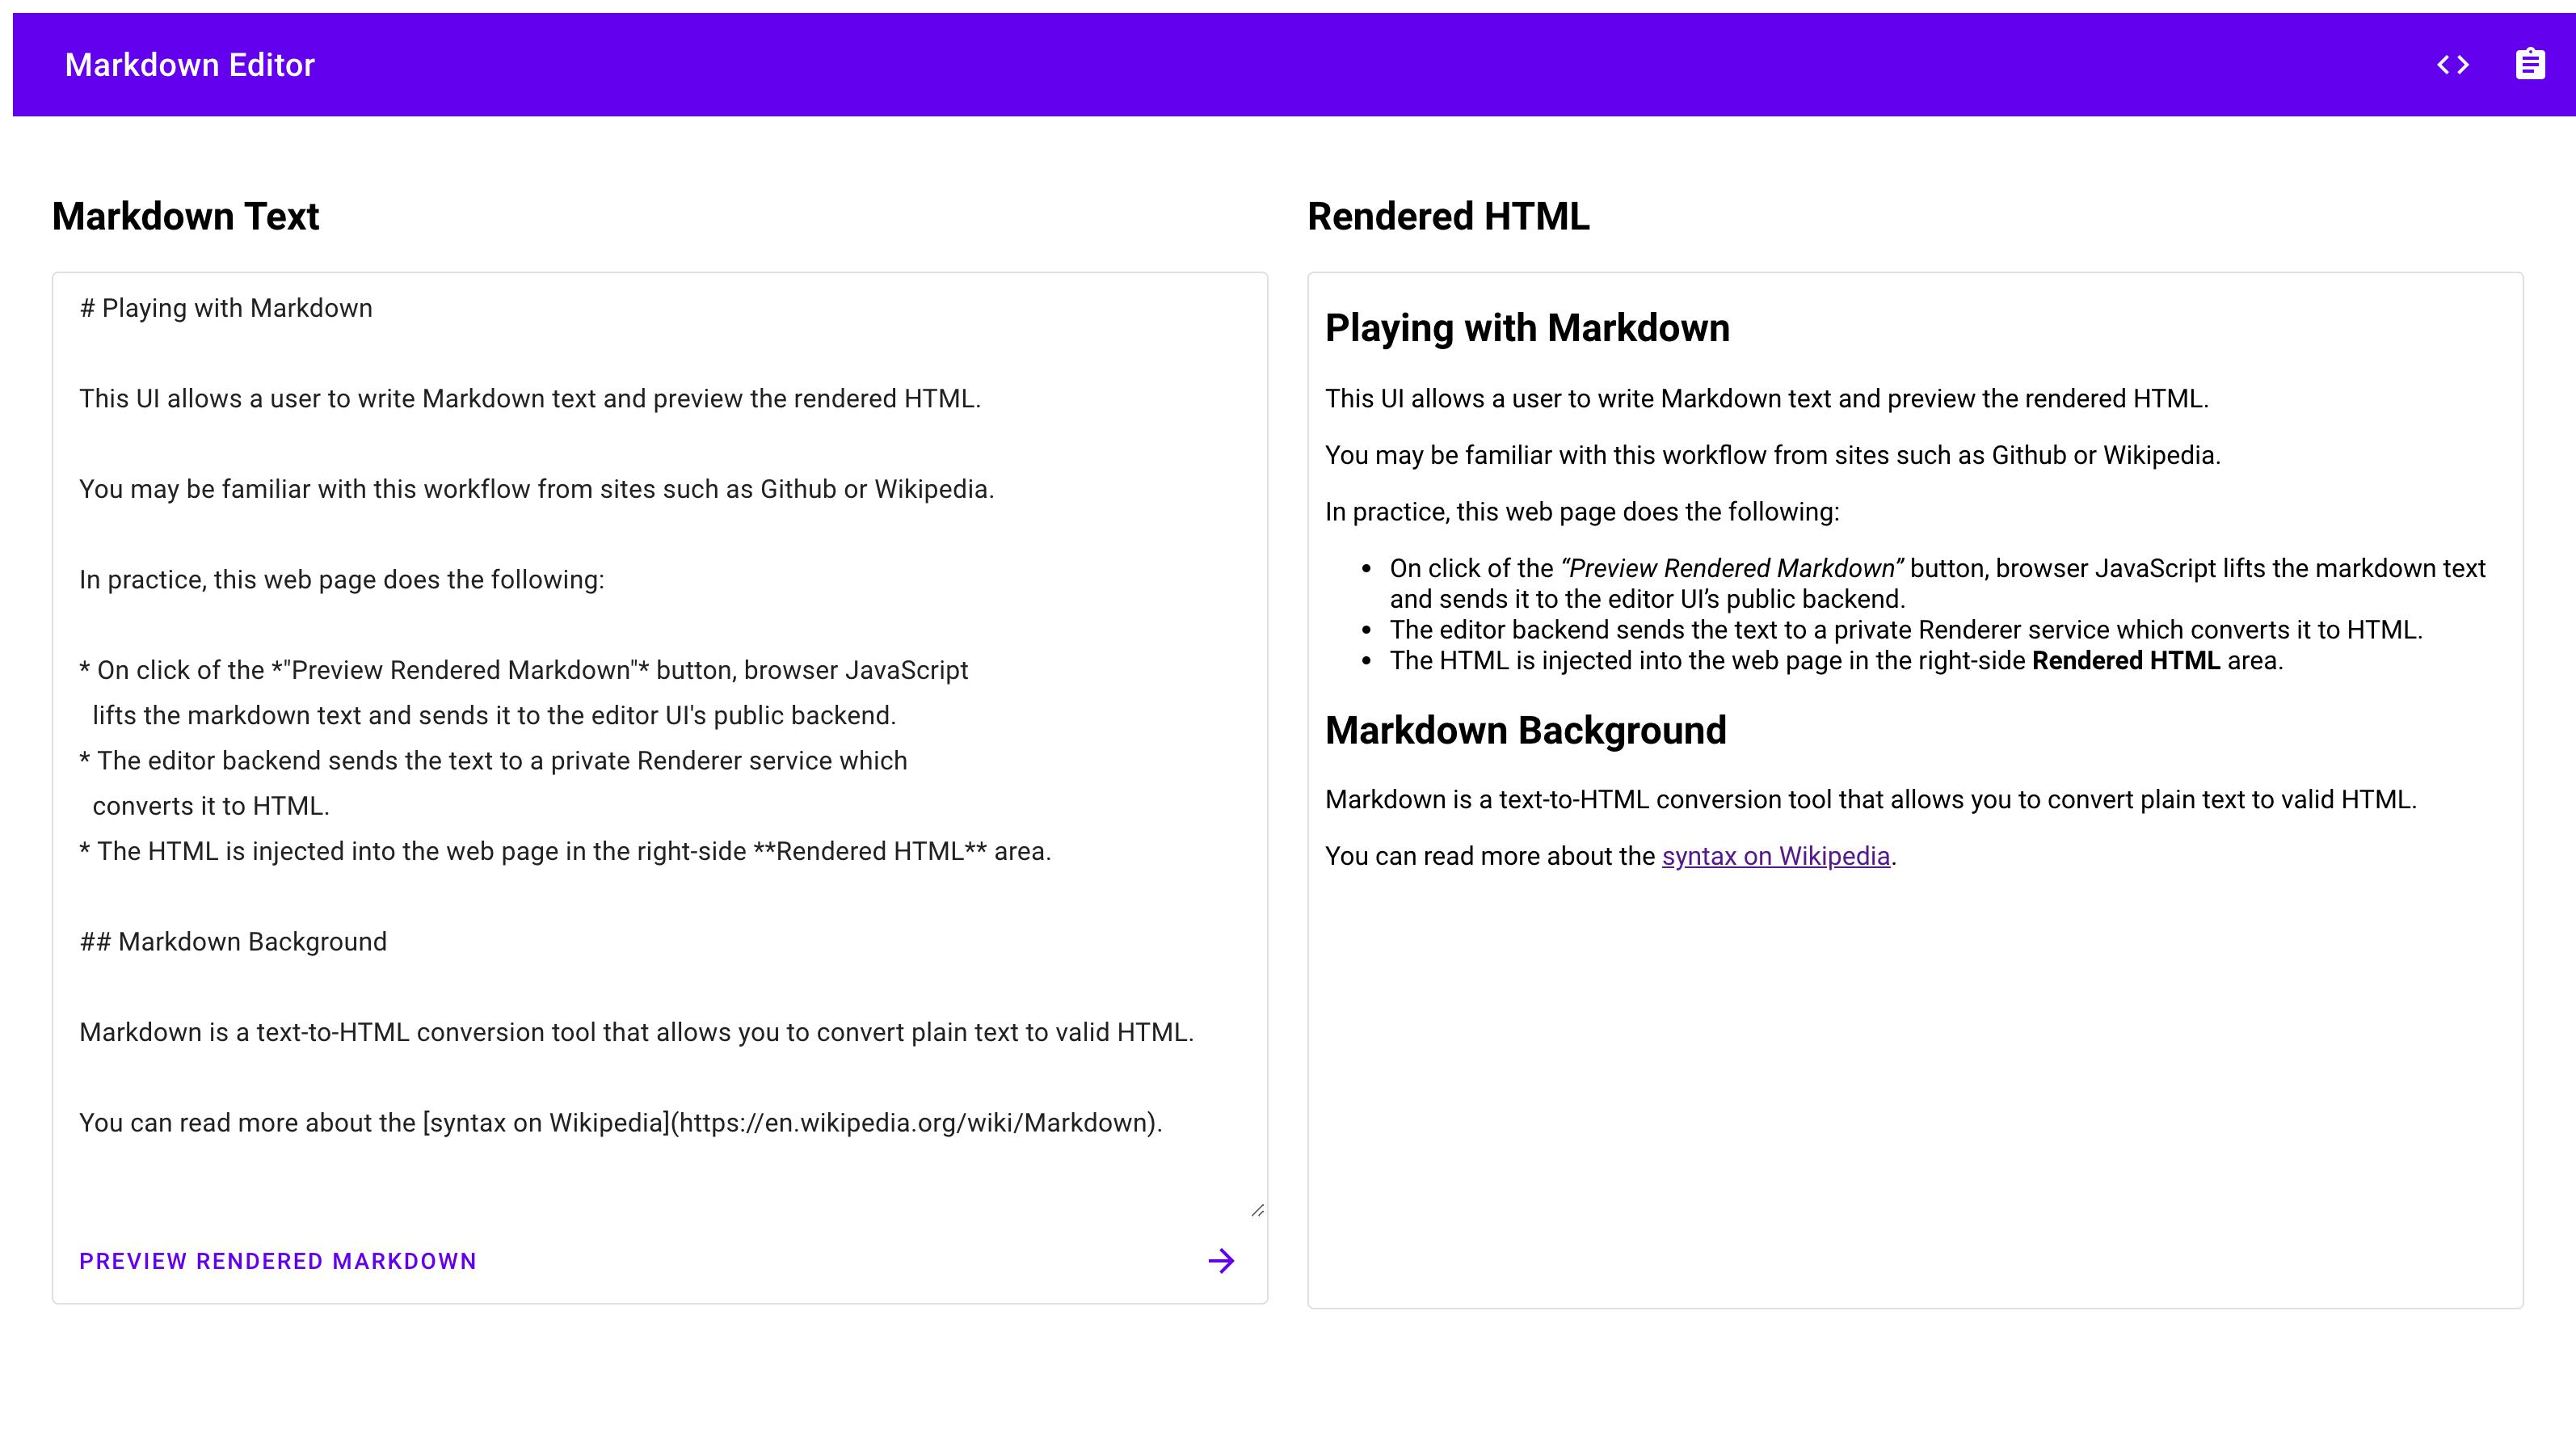 Screenshot of the Markdown Editor User Interface